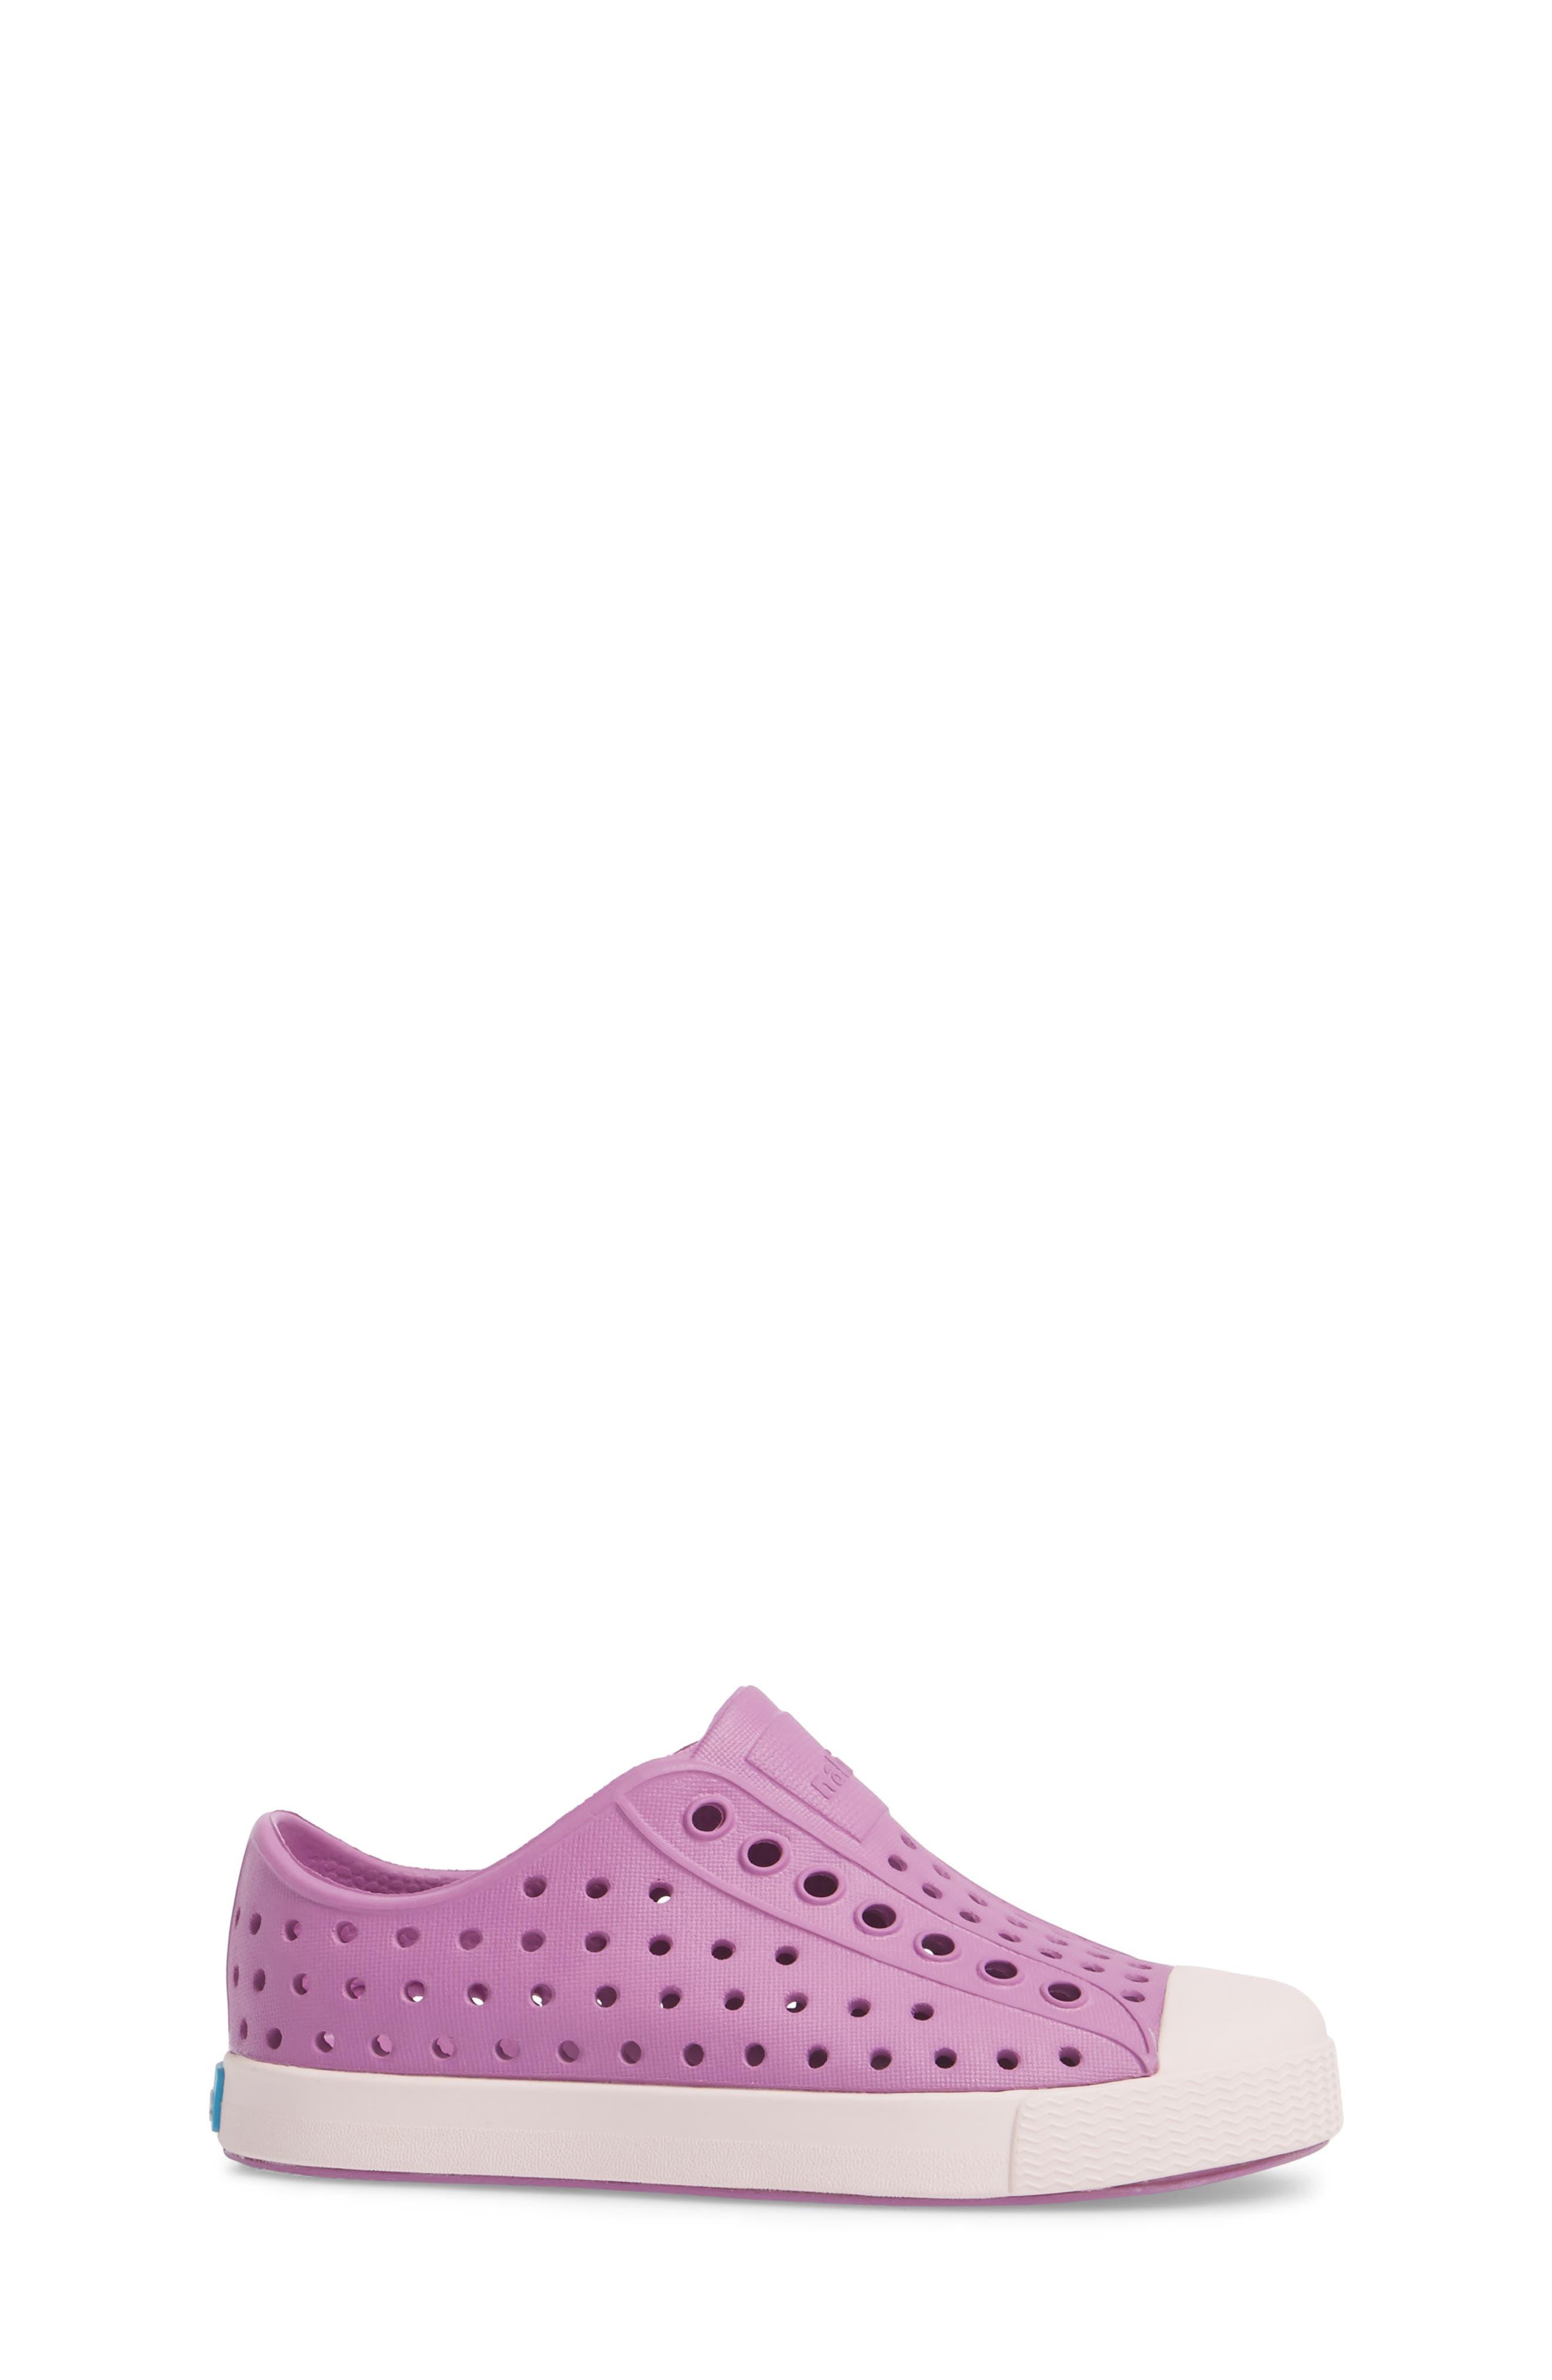 'Jefferson' Water Friendly Slip-On Sneaker,                             Alternate thumbnail 211, color,